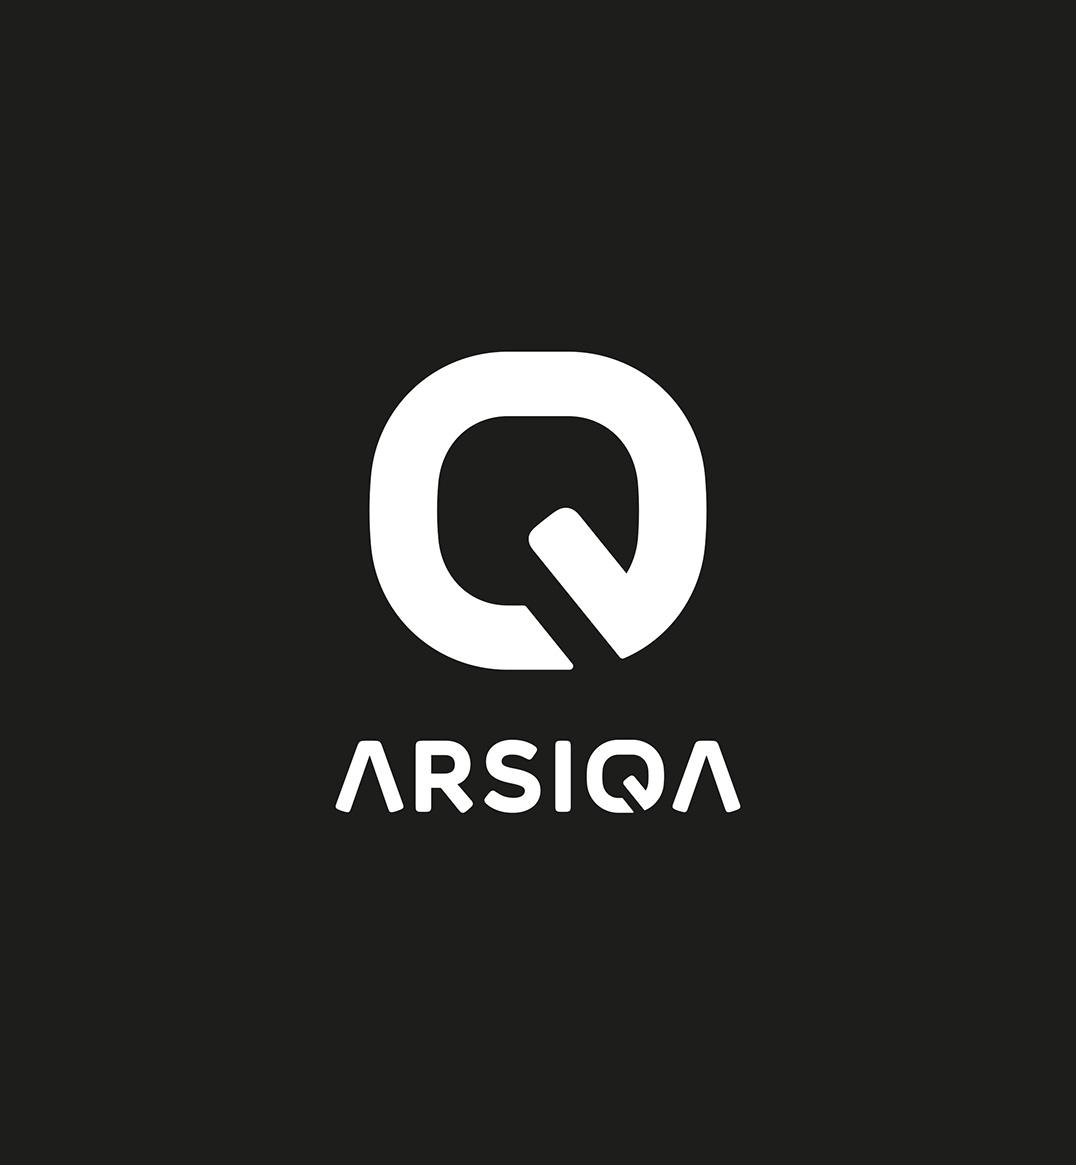 [album/Products_Model_Product/126/ARSIQA_logo_1c_inv.jpg]